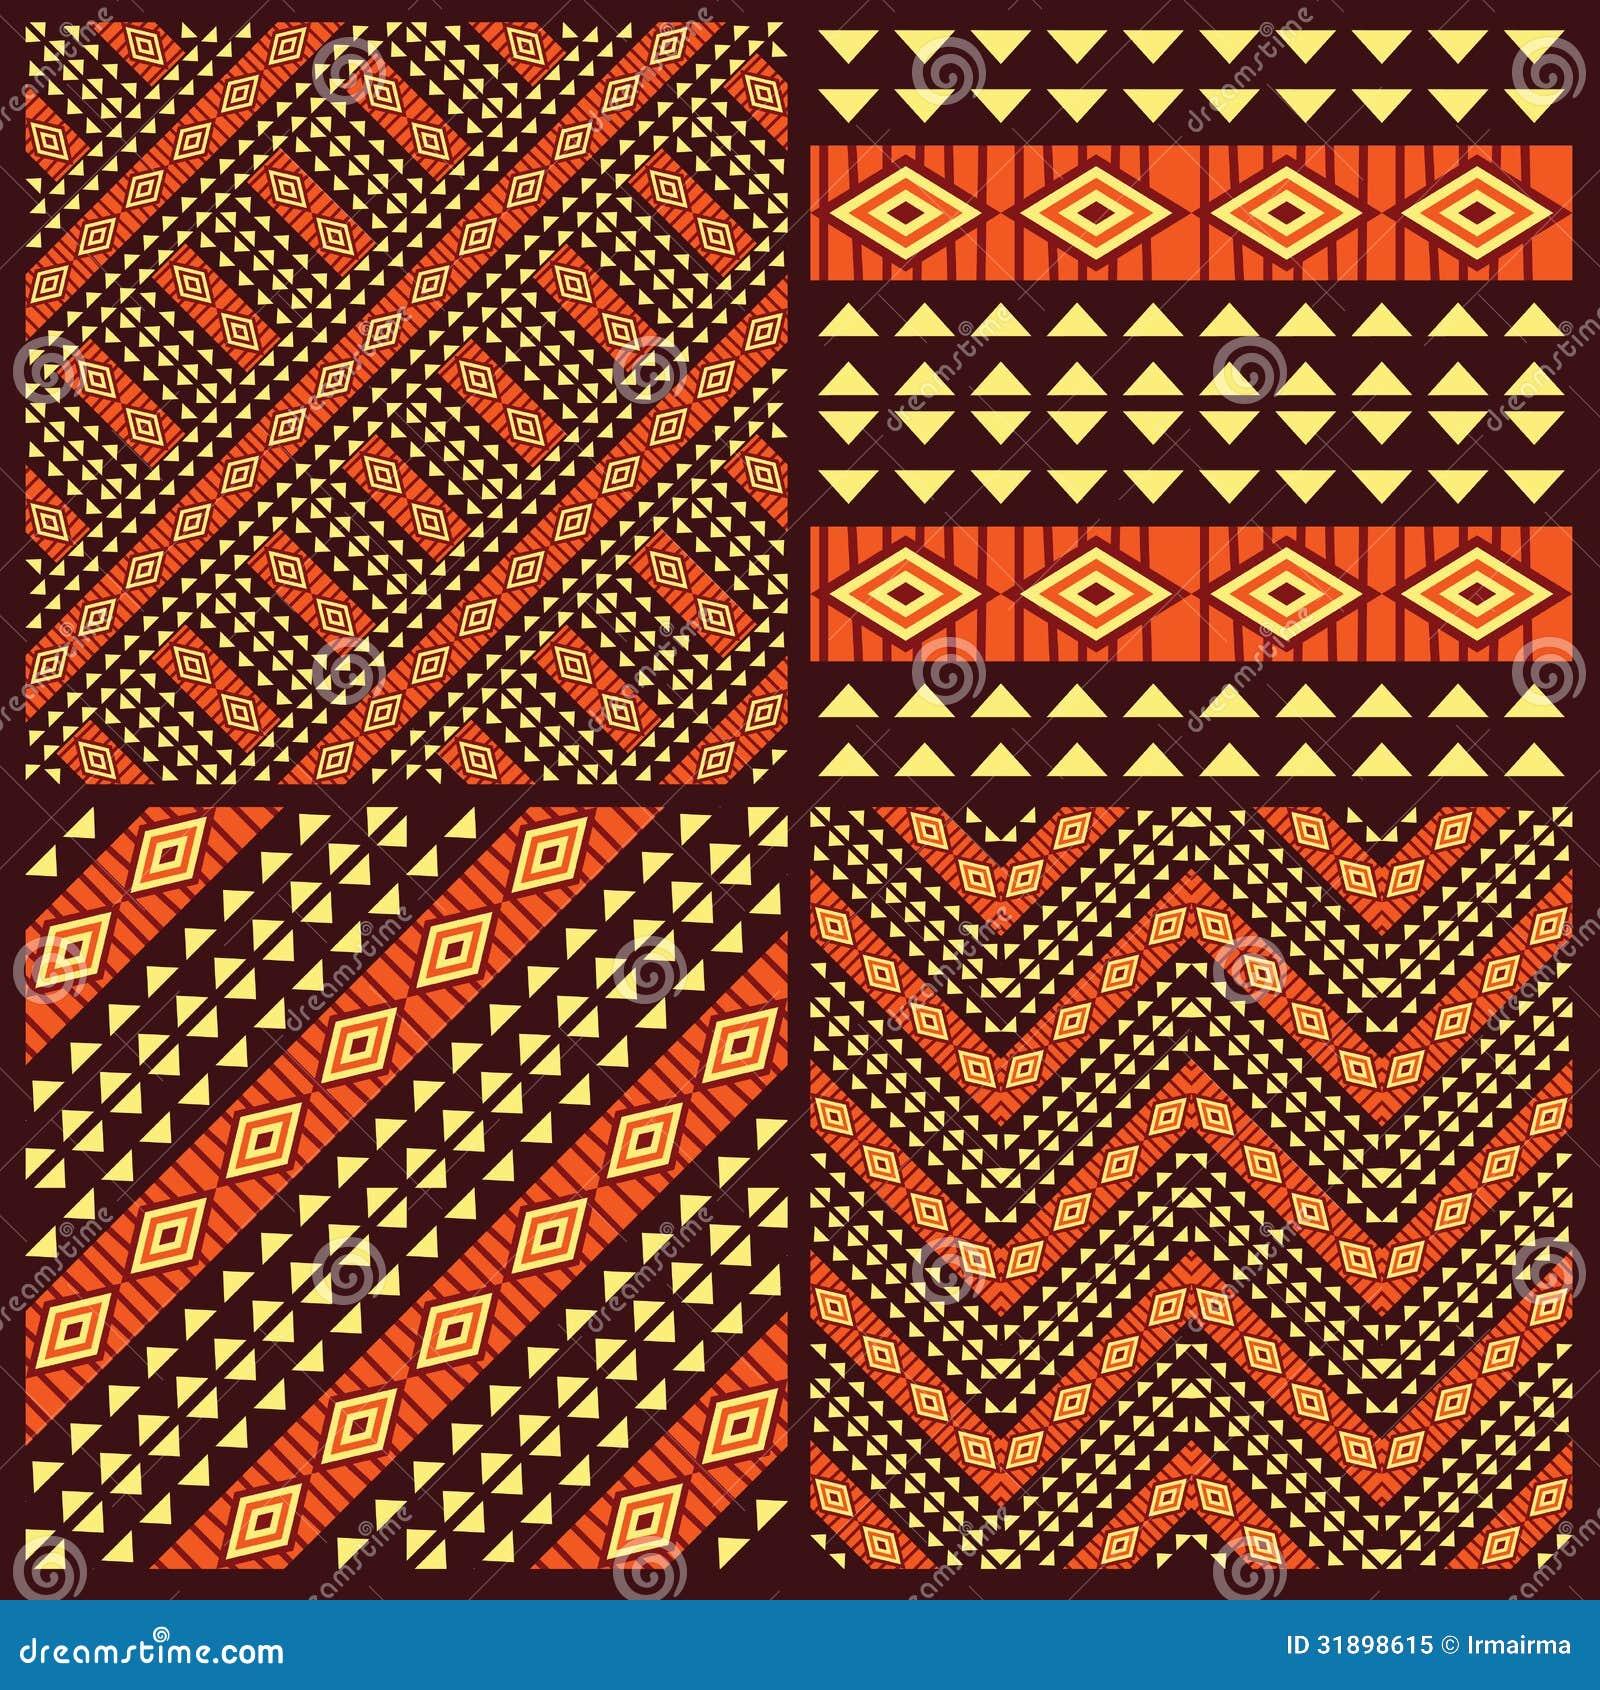 tribal african music essay